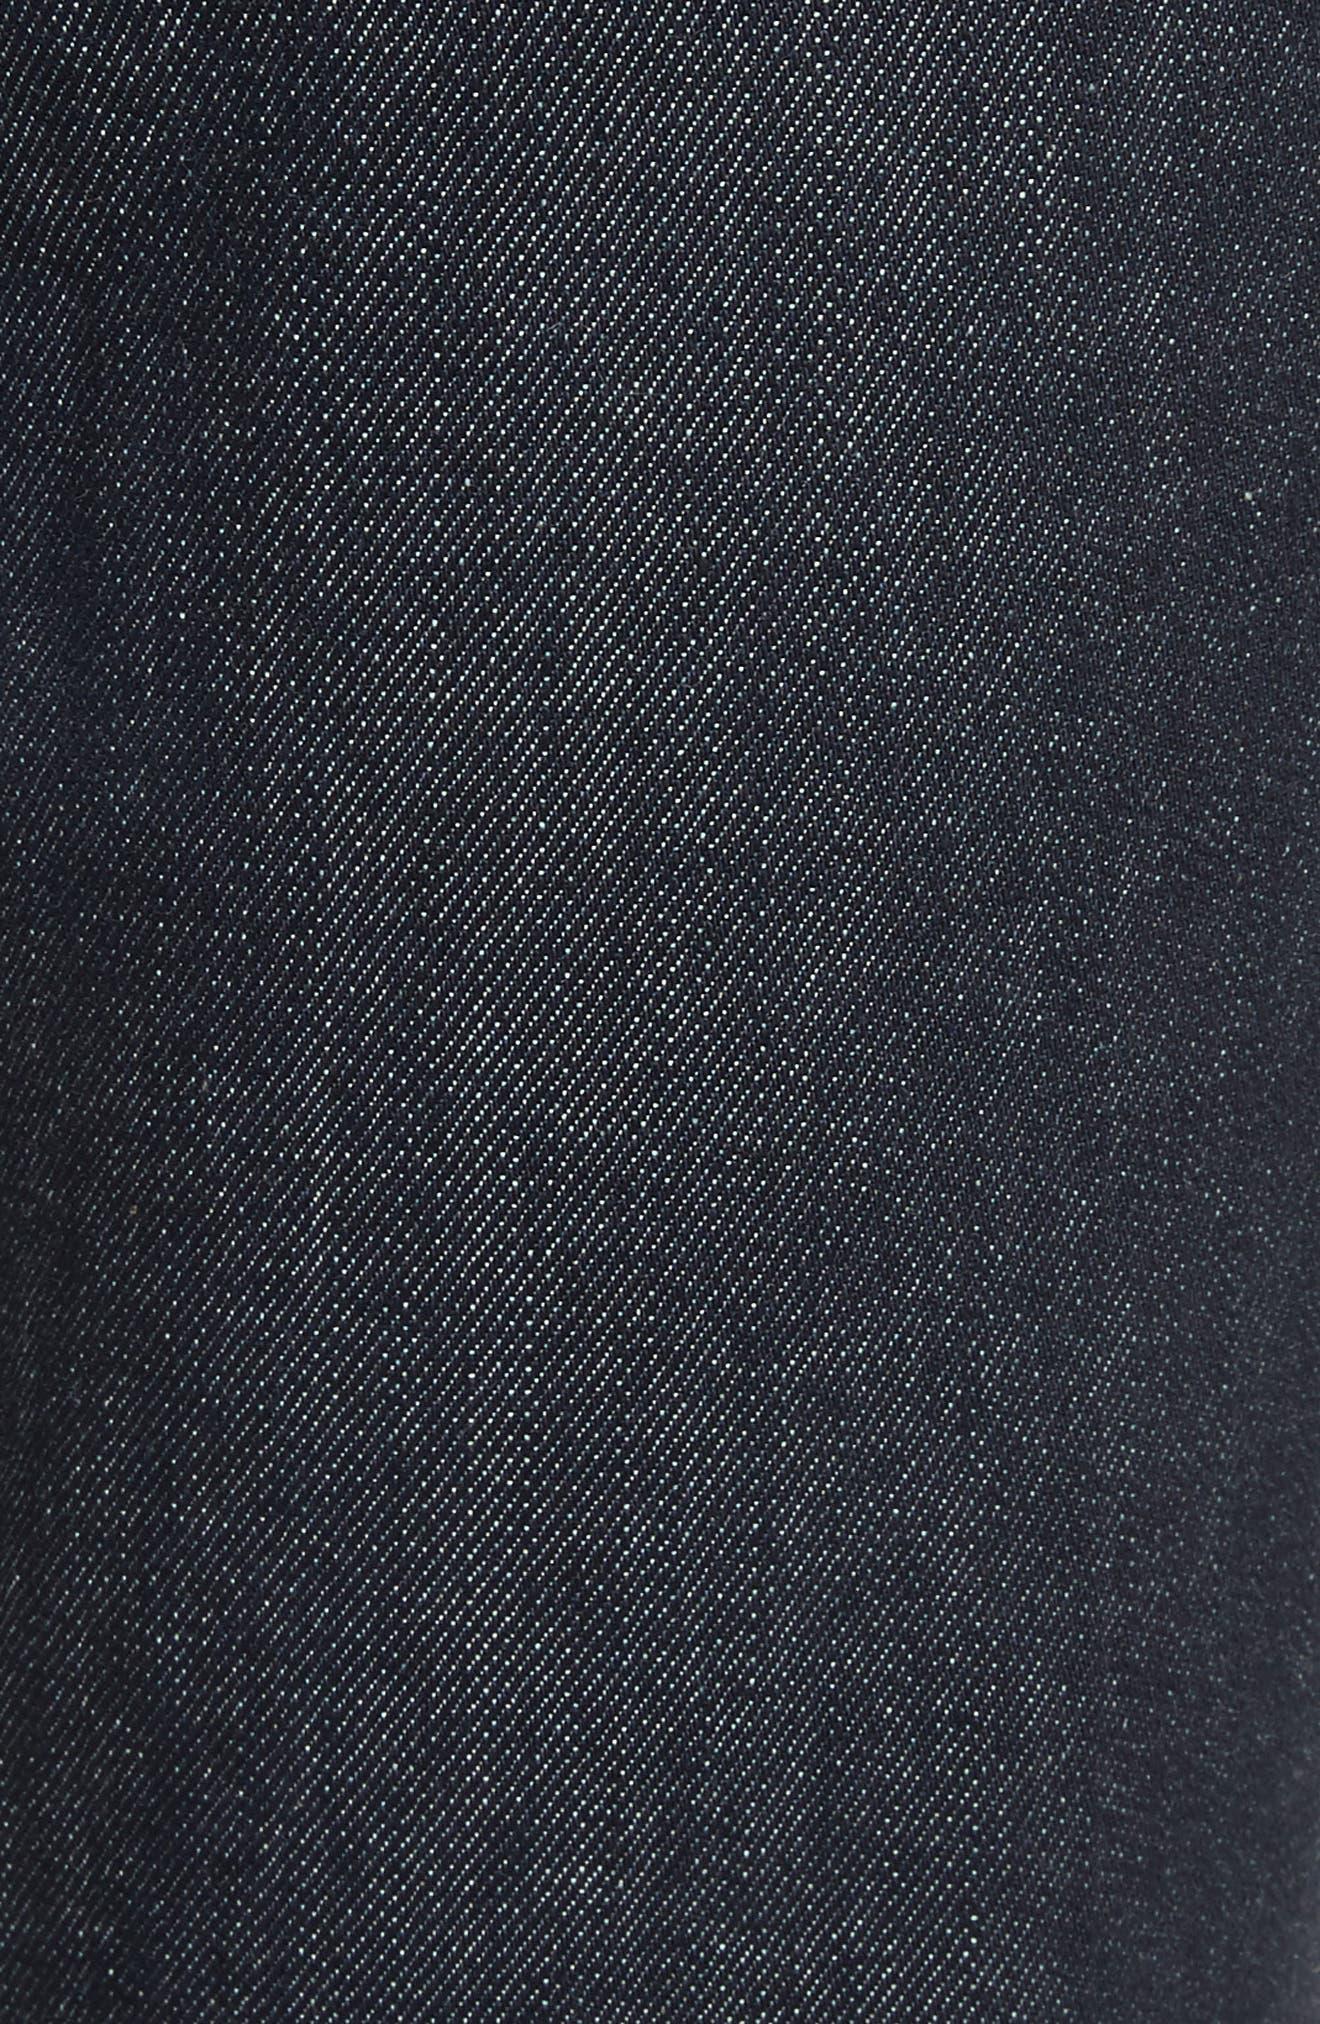 Belted Crop Jeans,                             Alternate thumbnail 5, color,